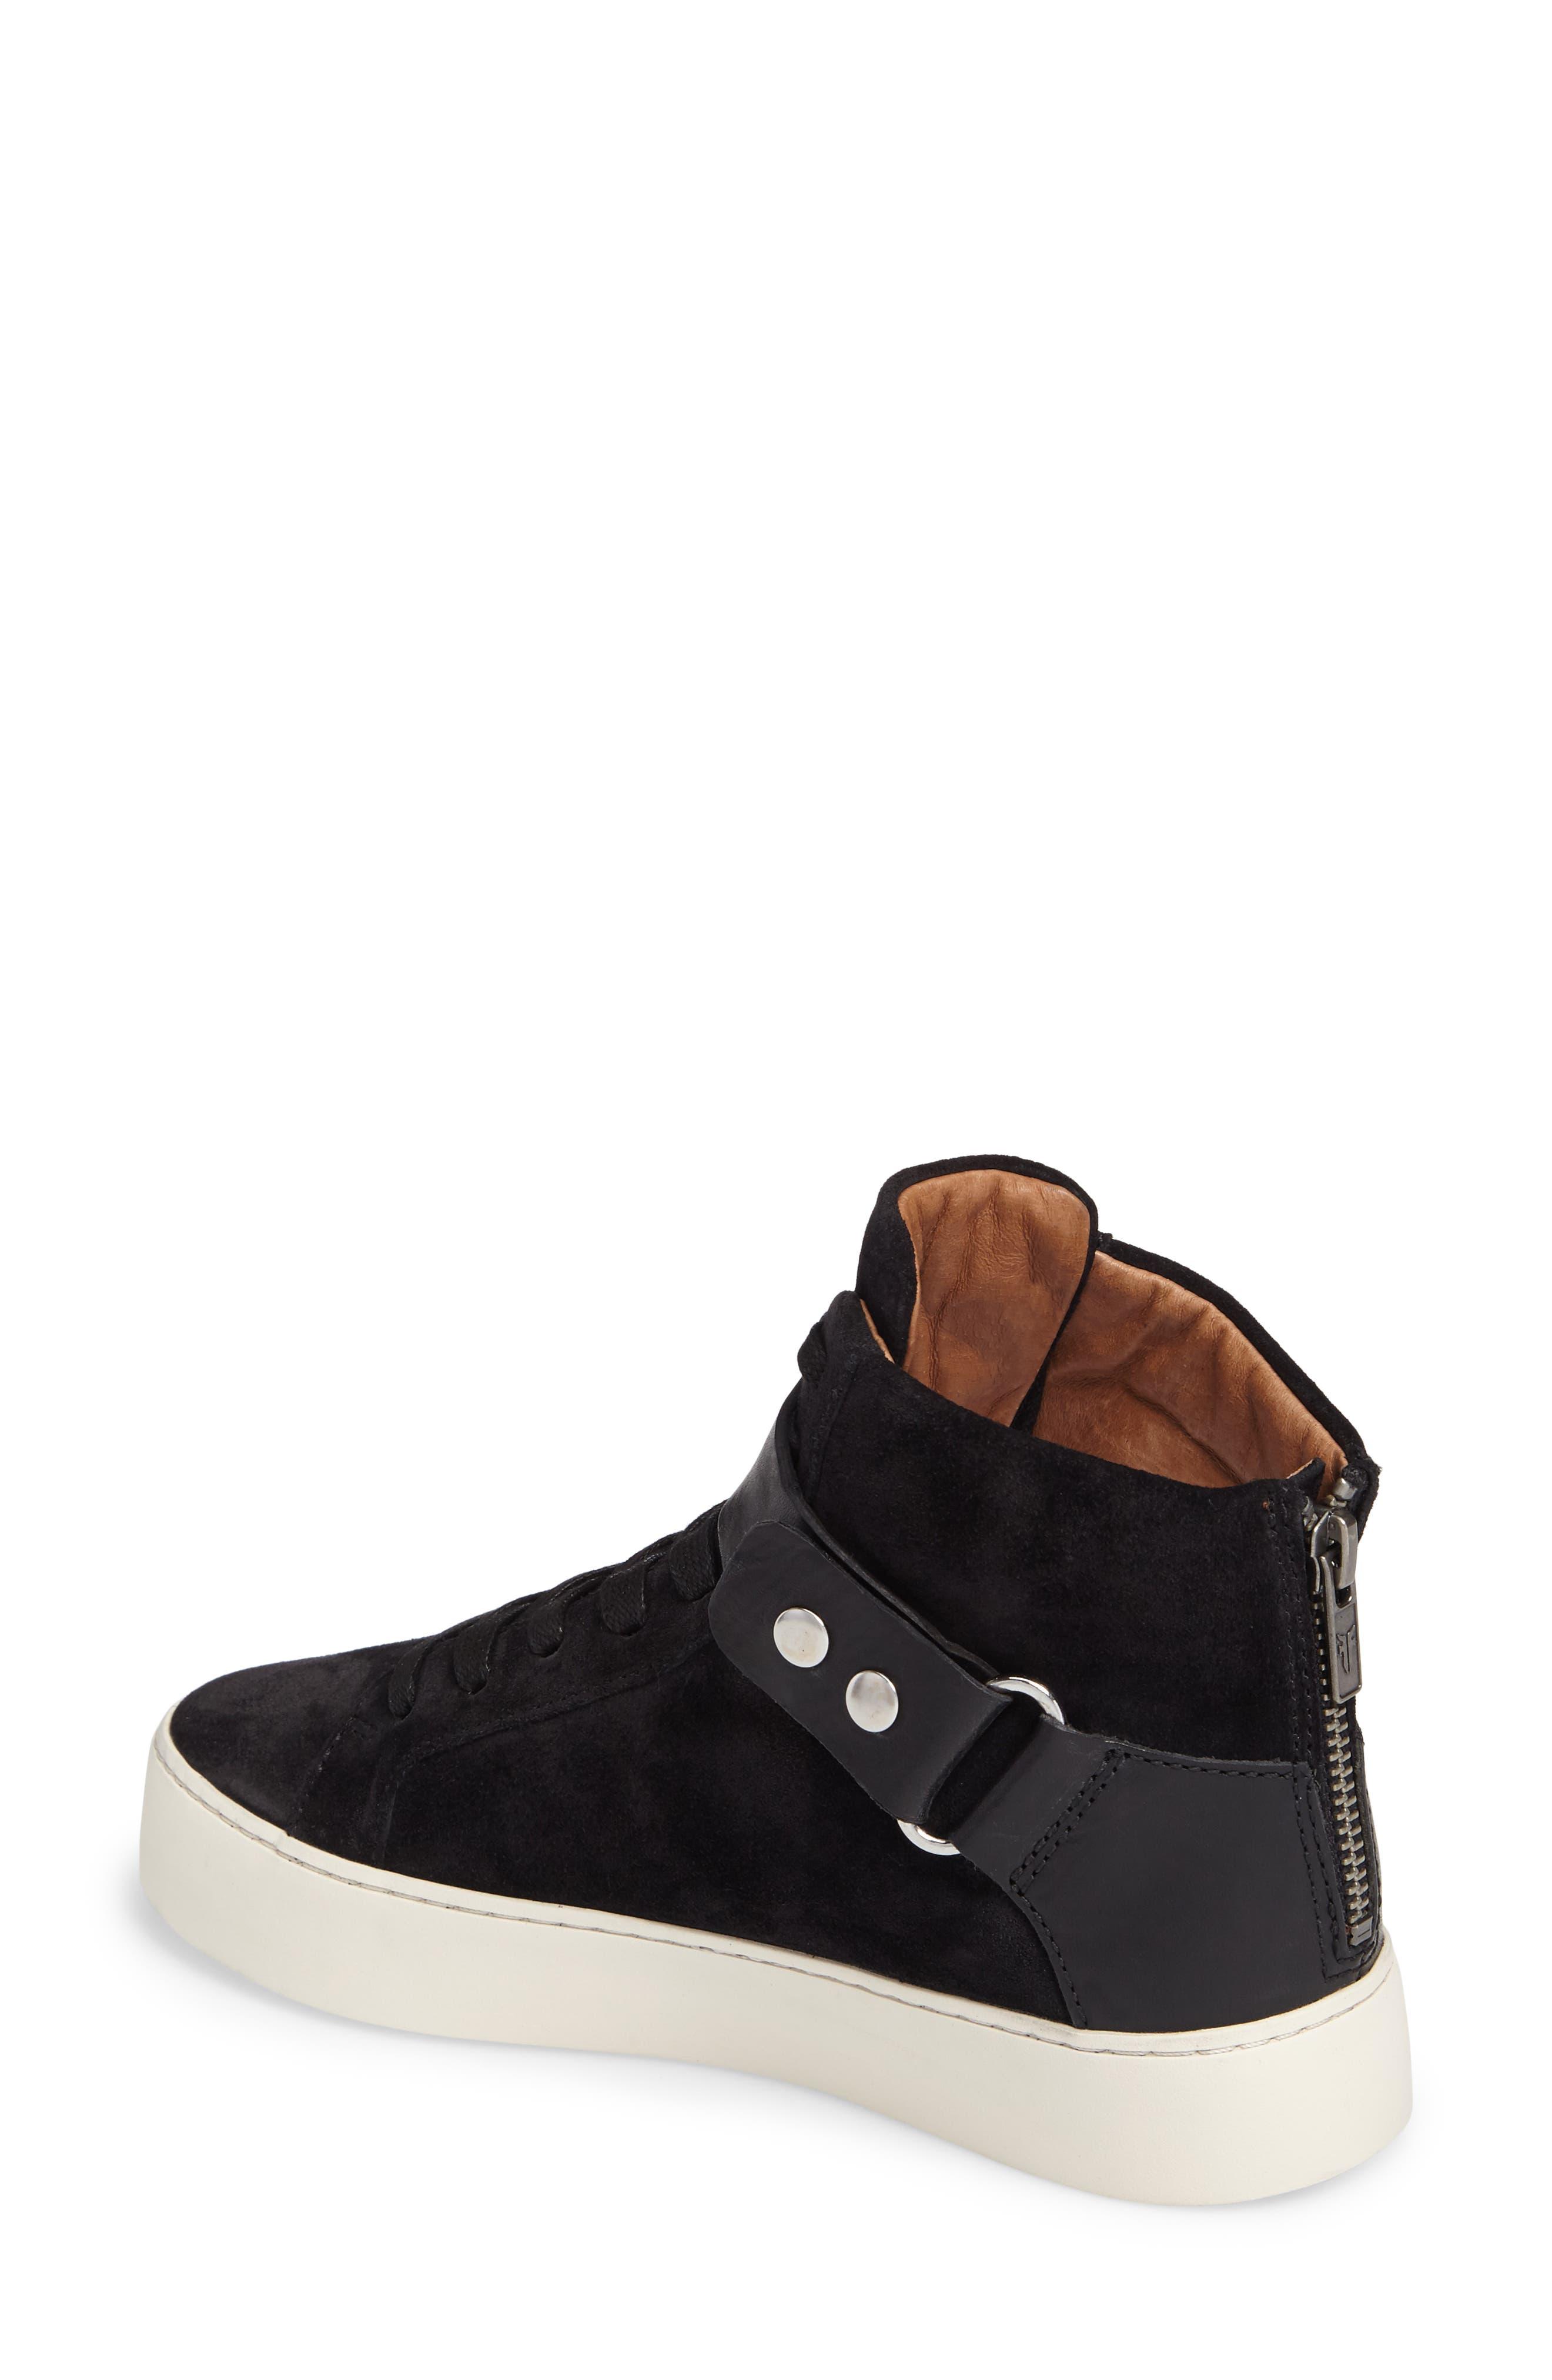 Lena Harness Sneaker,                             Alternate thumbnail 2, color,                             Black